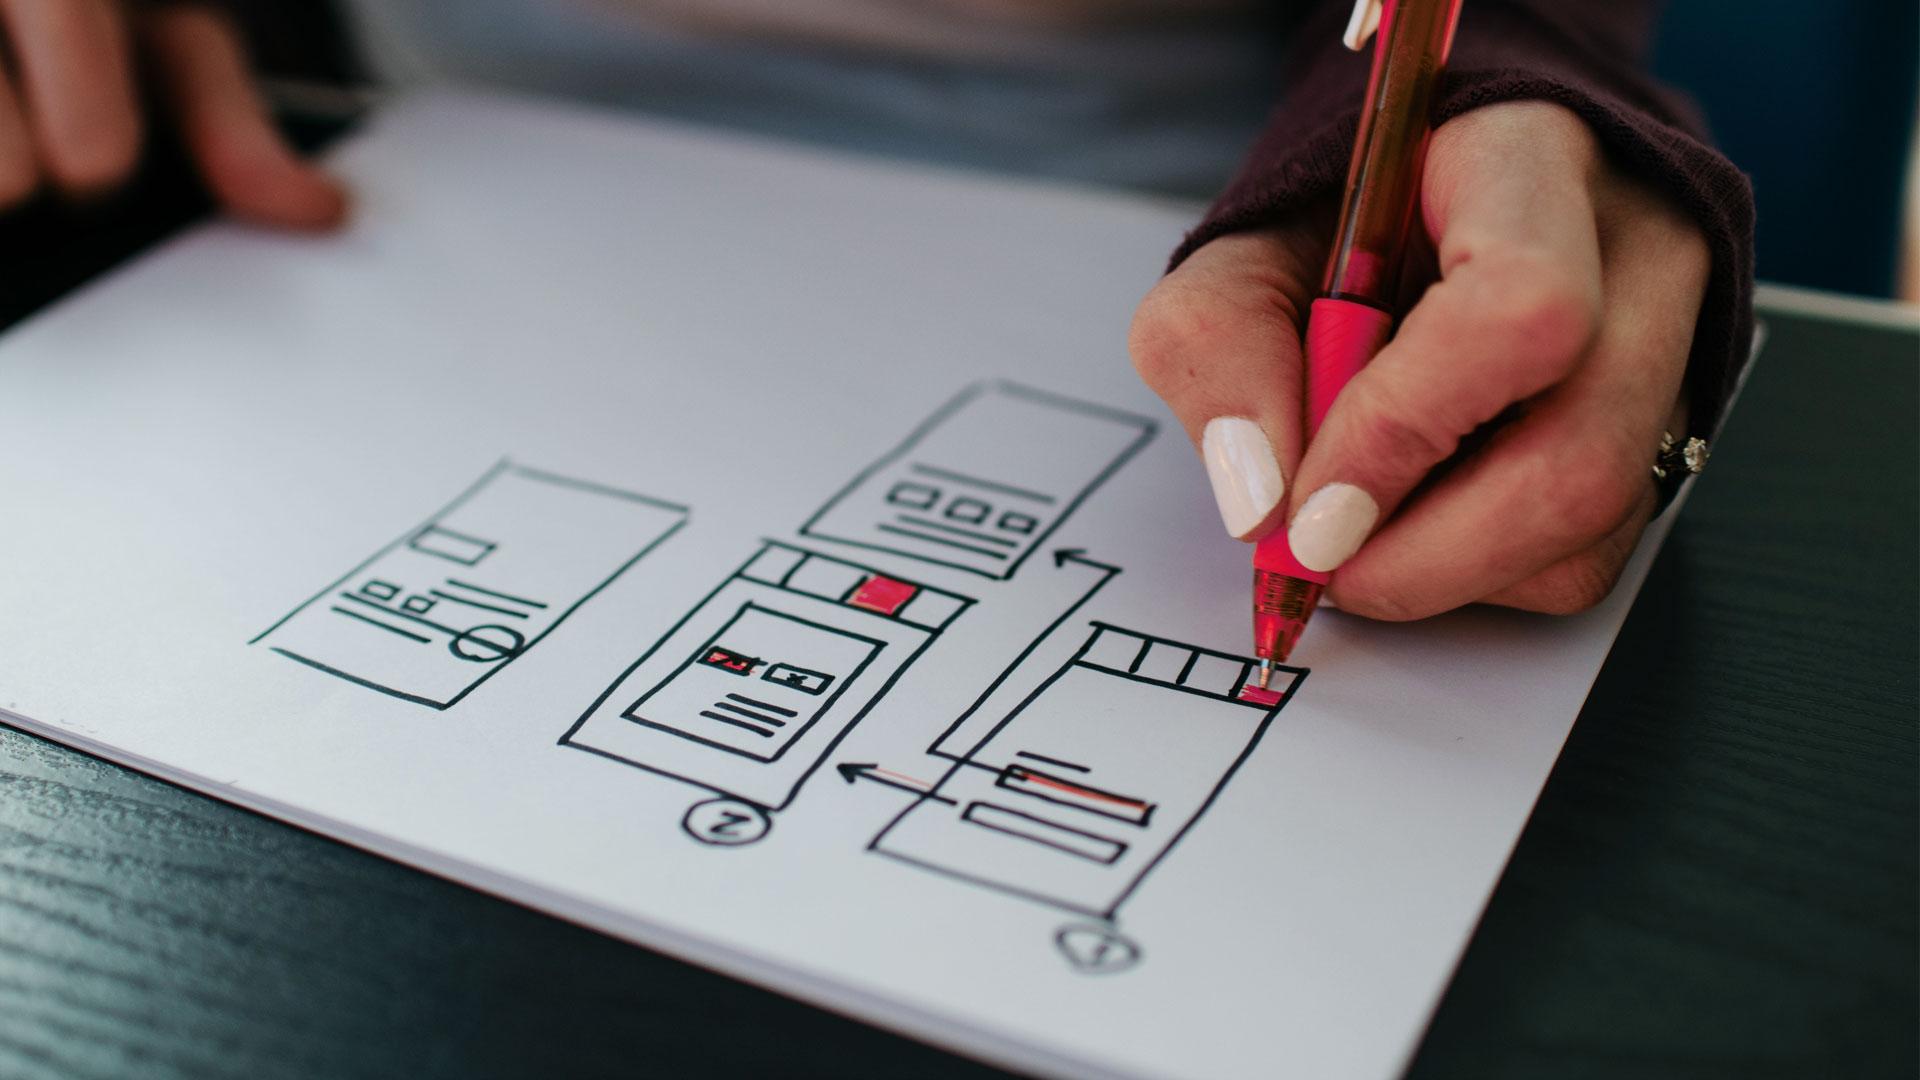 Focus On The User: Trends in UI/UX Design